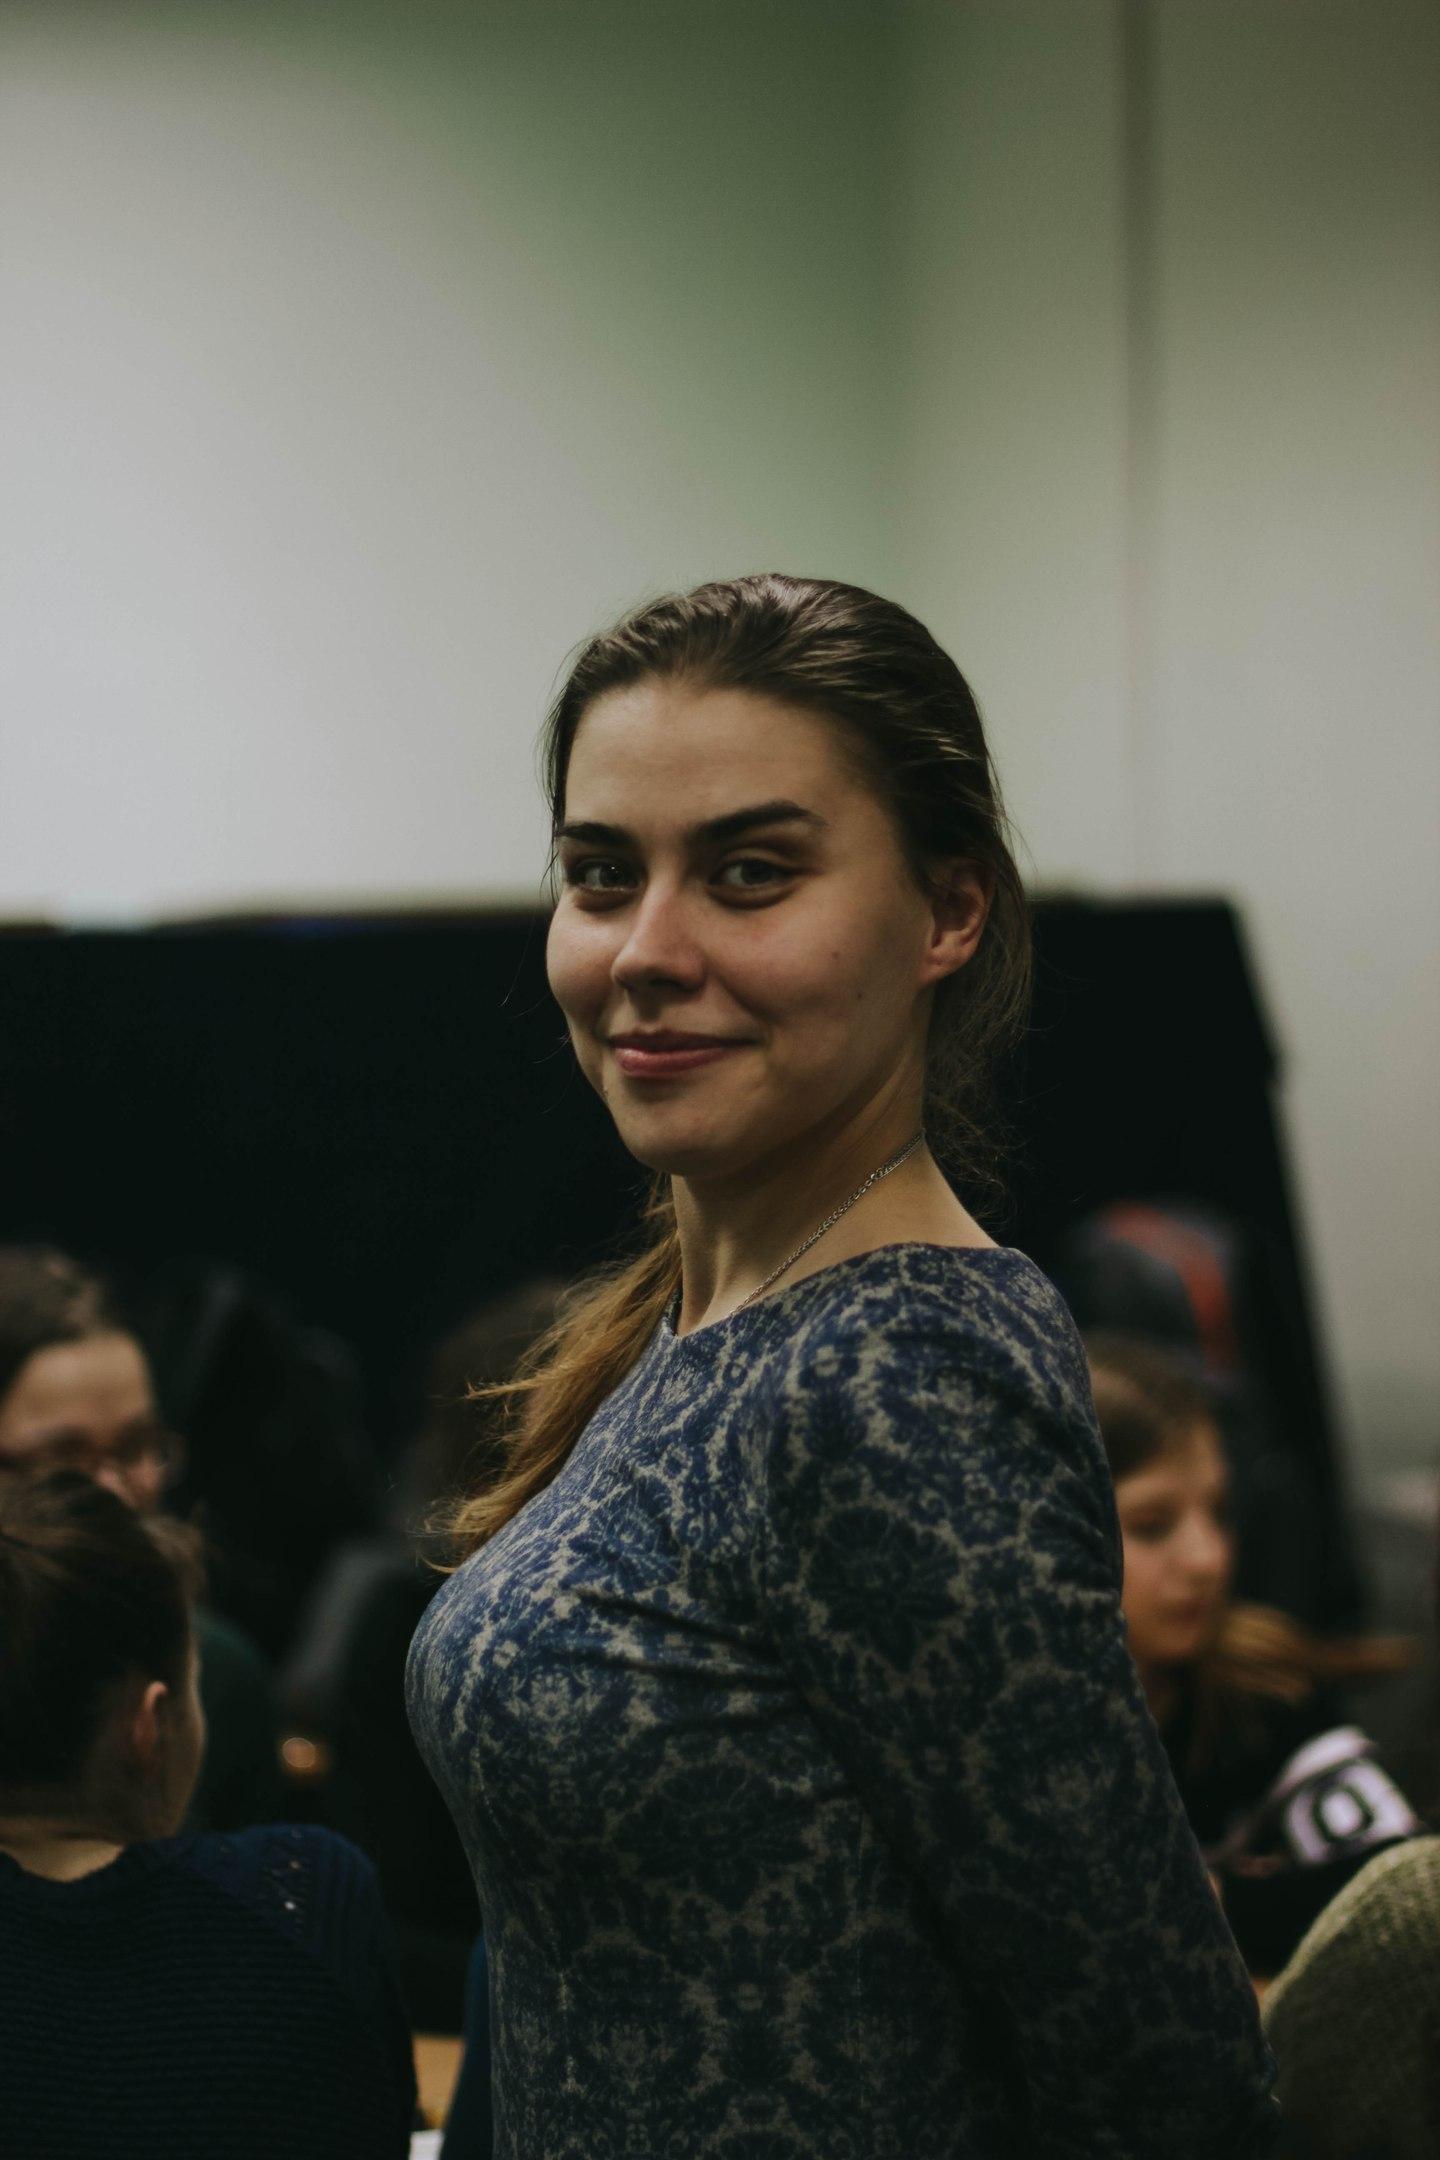 Агеева Мария Николаевна